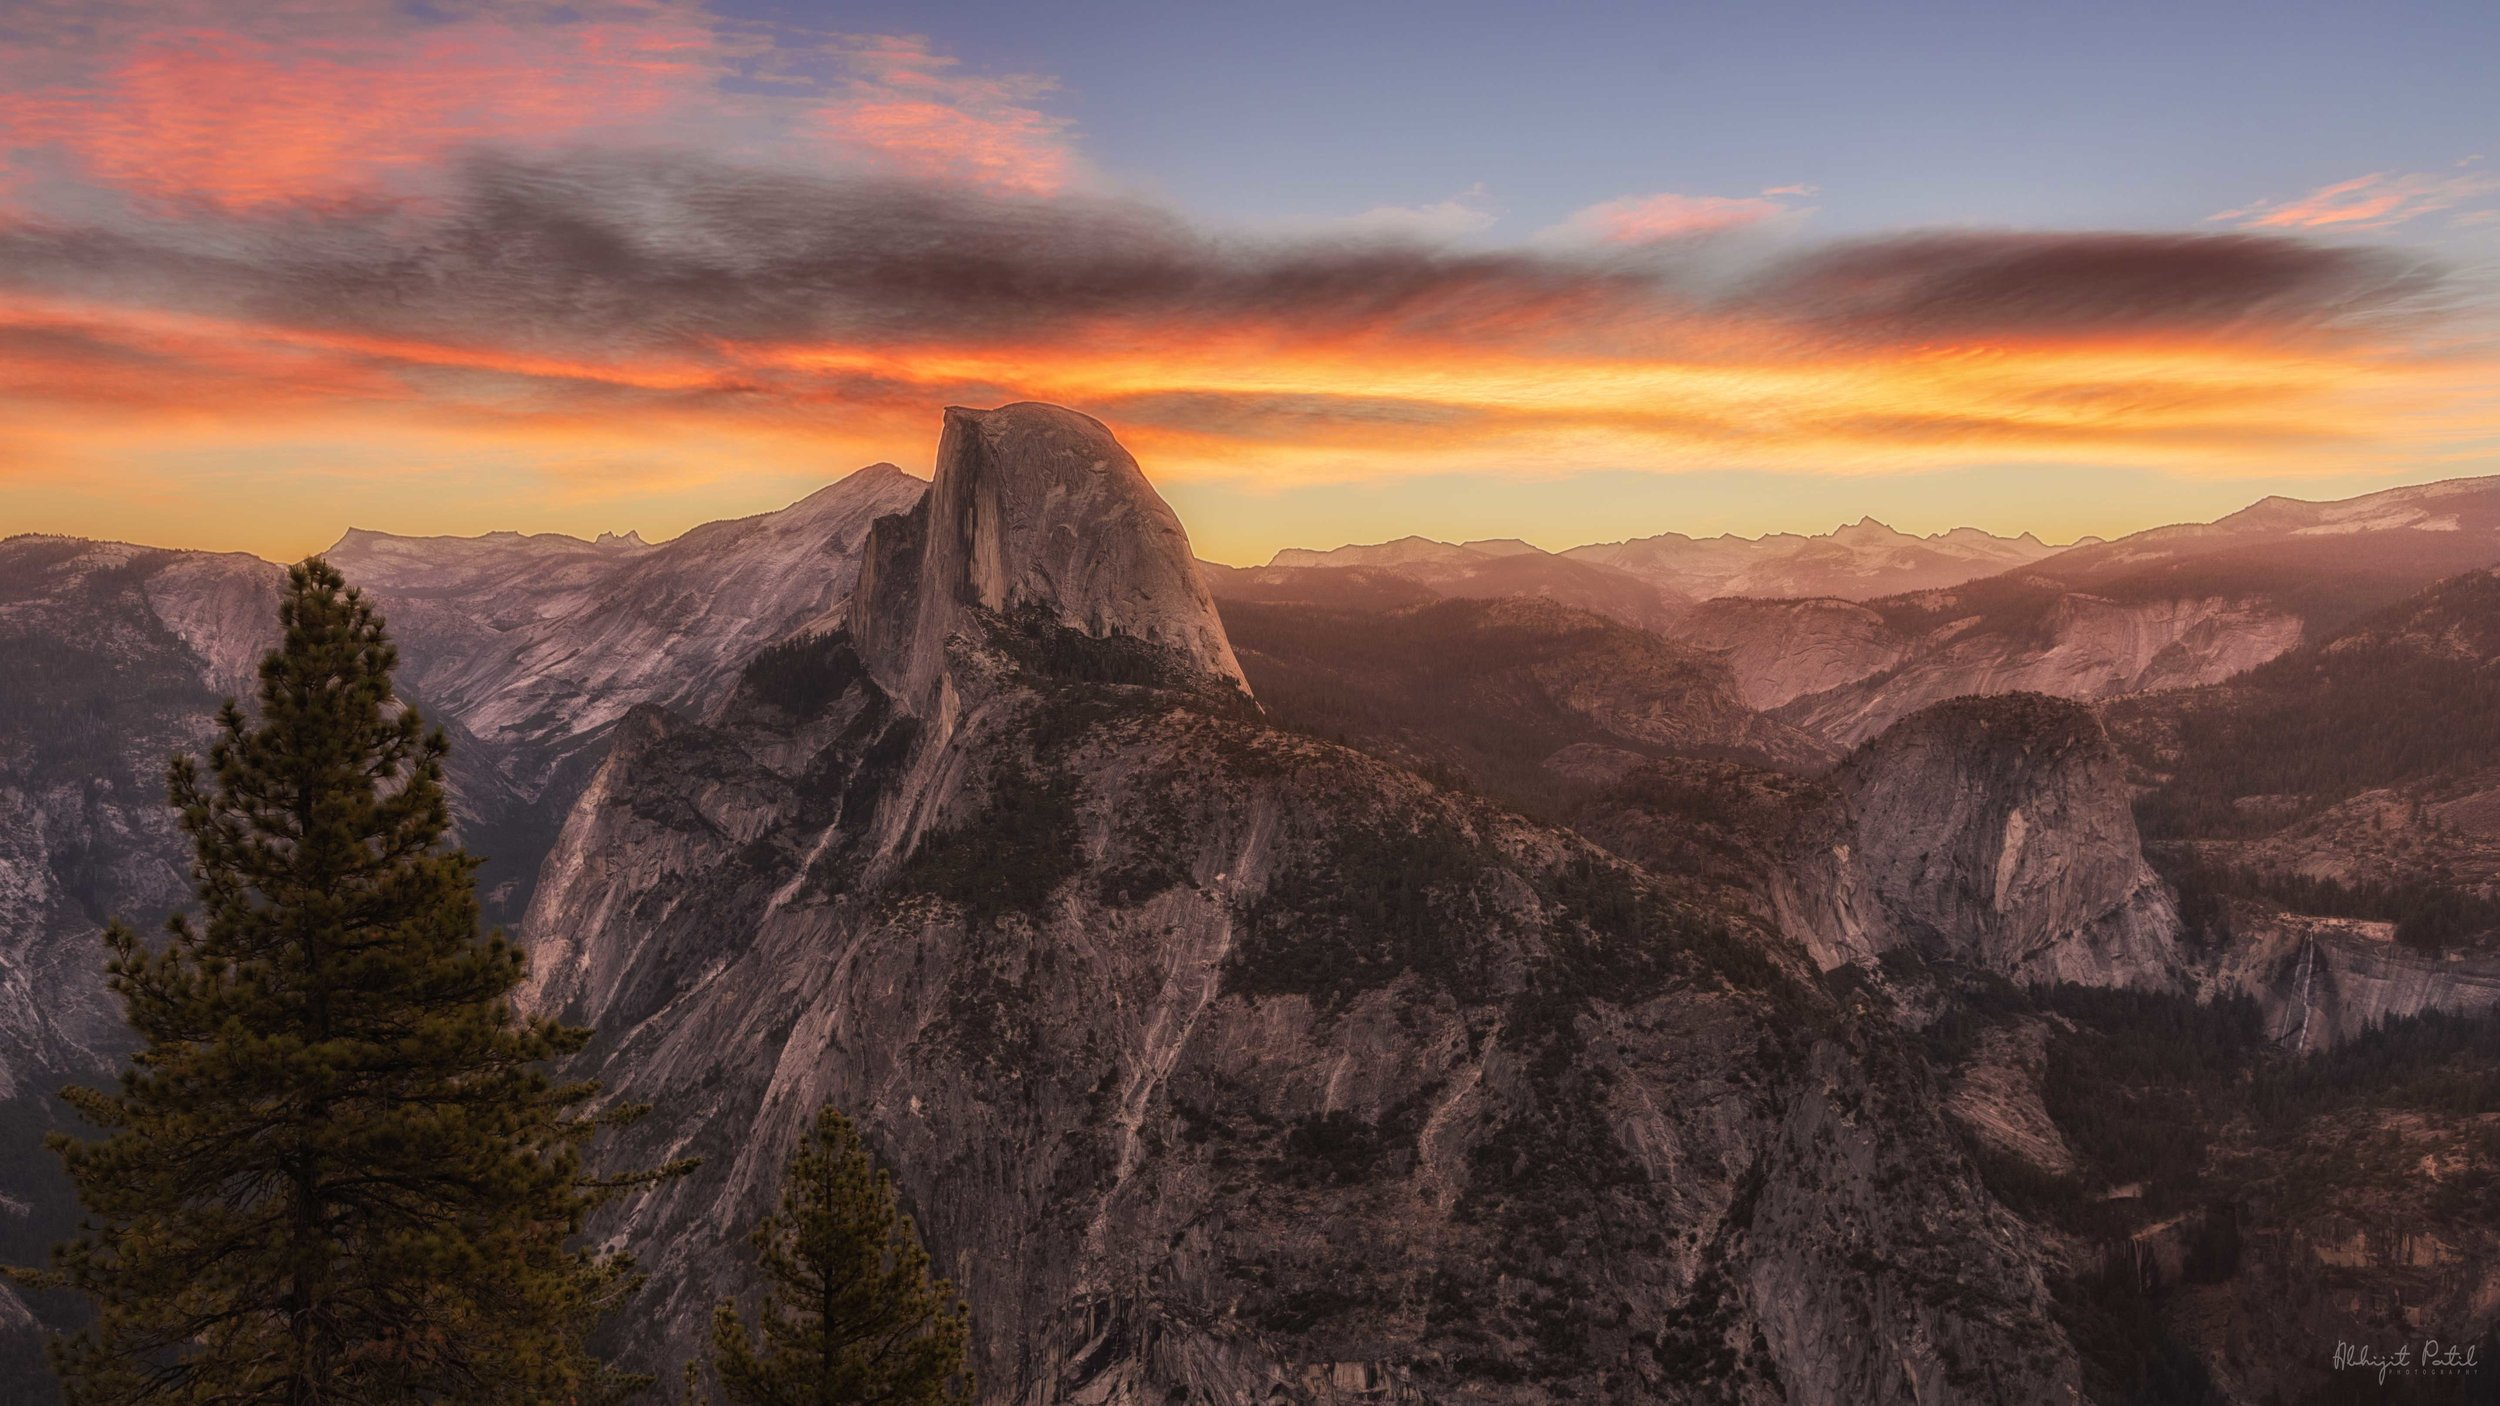 Half_dome_sunrise.jpg